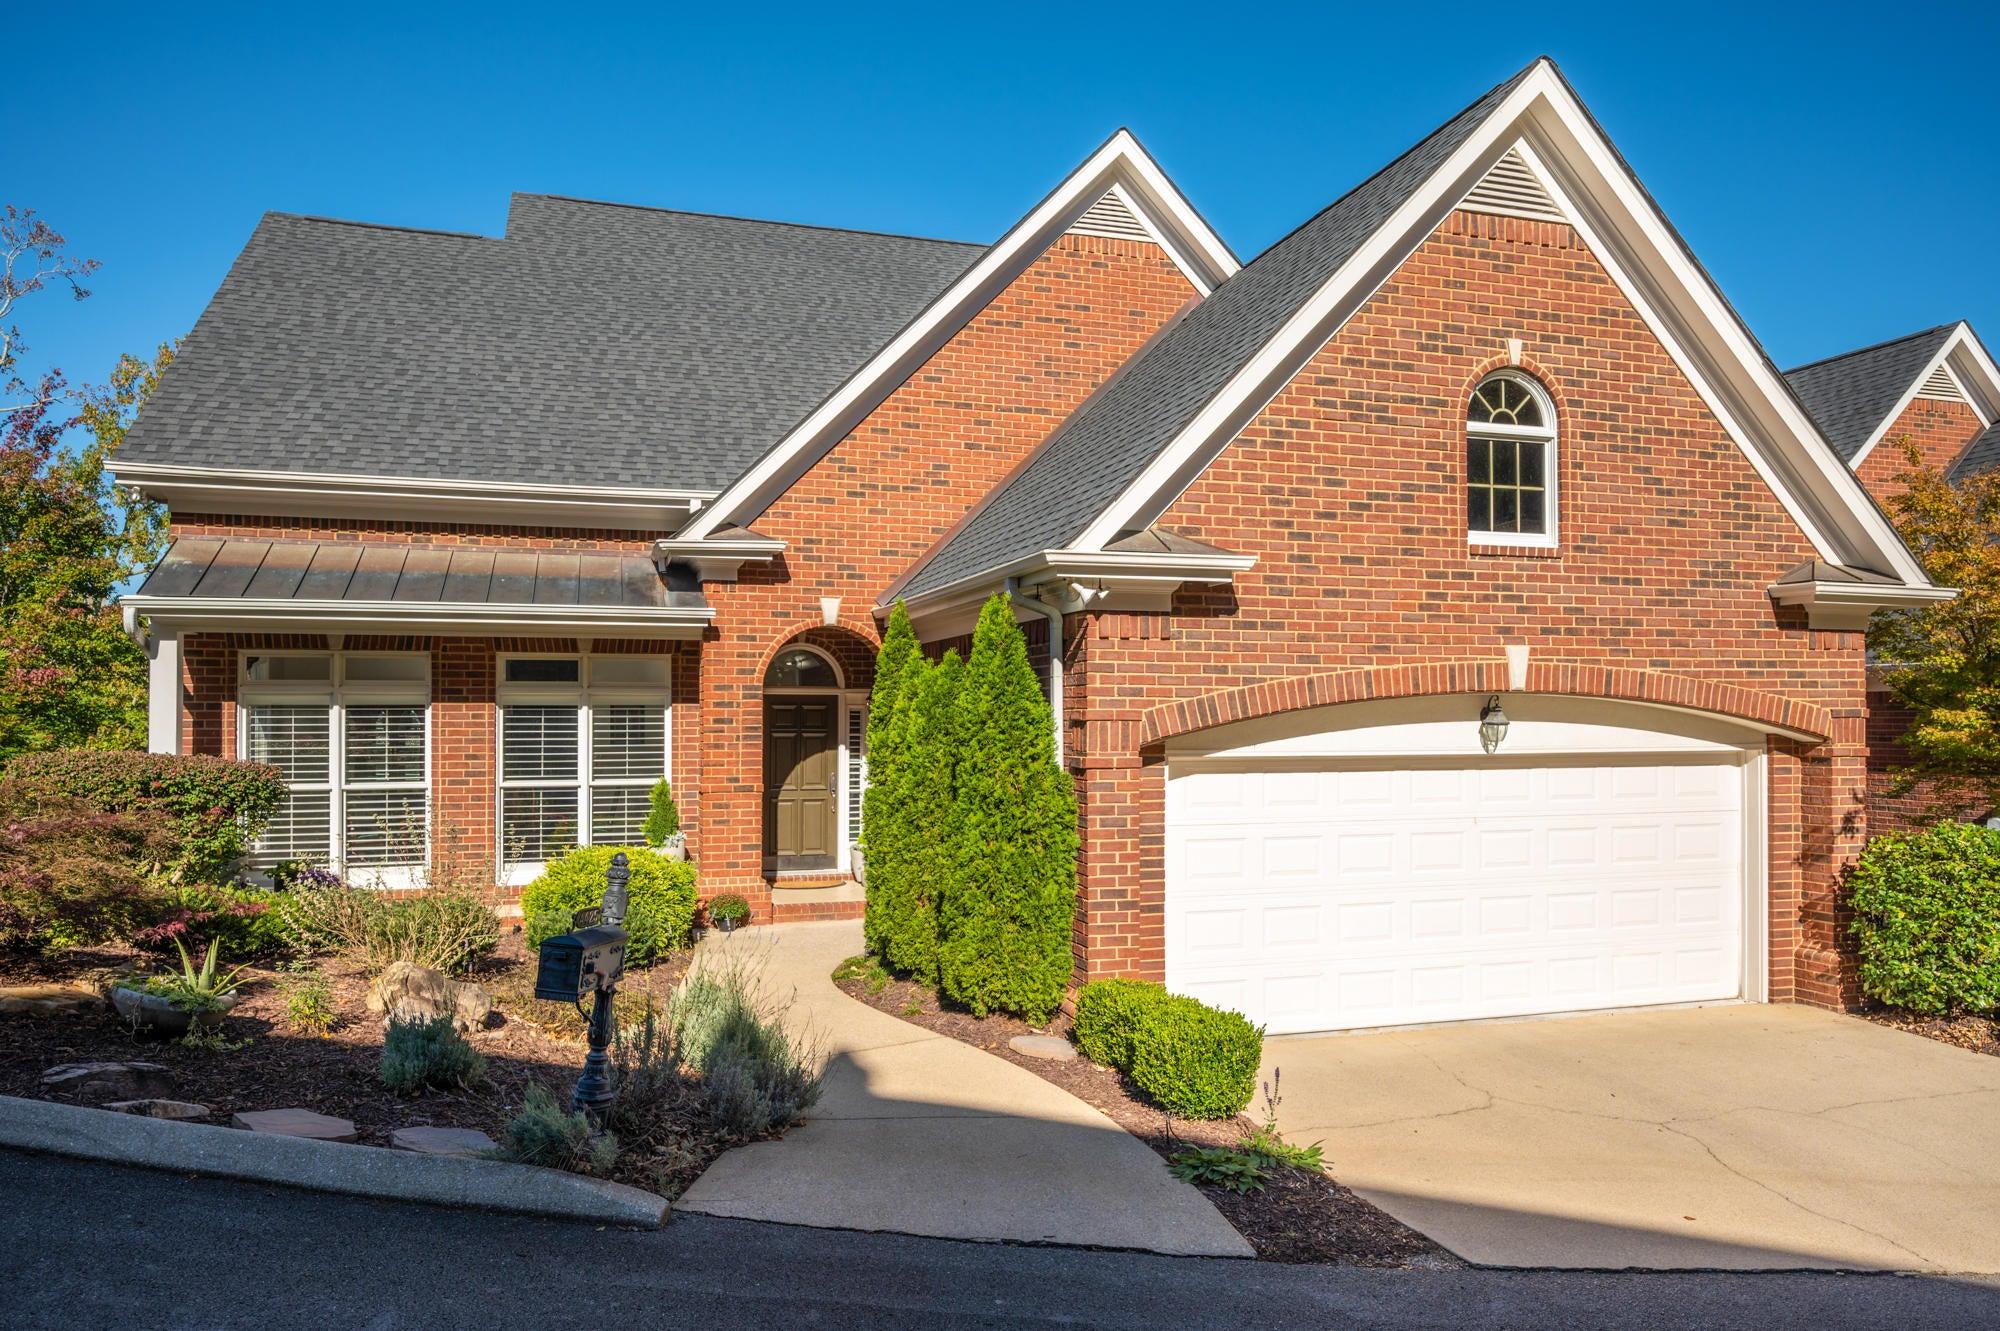 4425 Webb Rd, Chattanooga, TN 37416